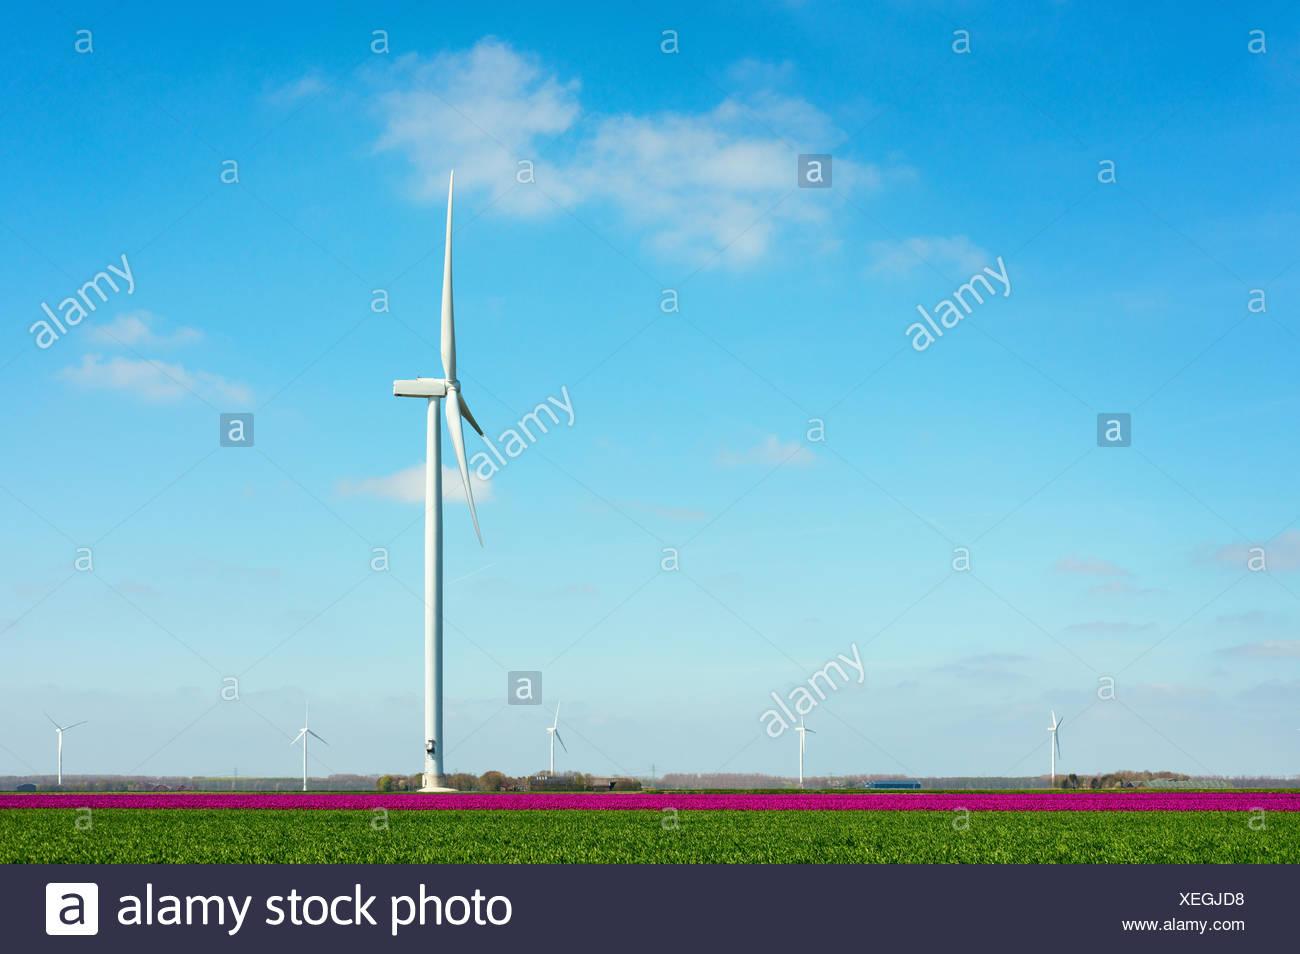 Field with magenta flower blooms and wind turbine, Zeewolde, Flevoland, Netherlands - Stock Image